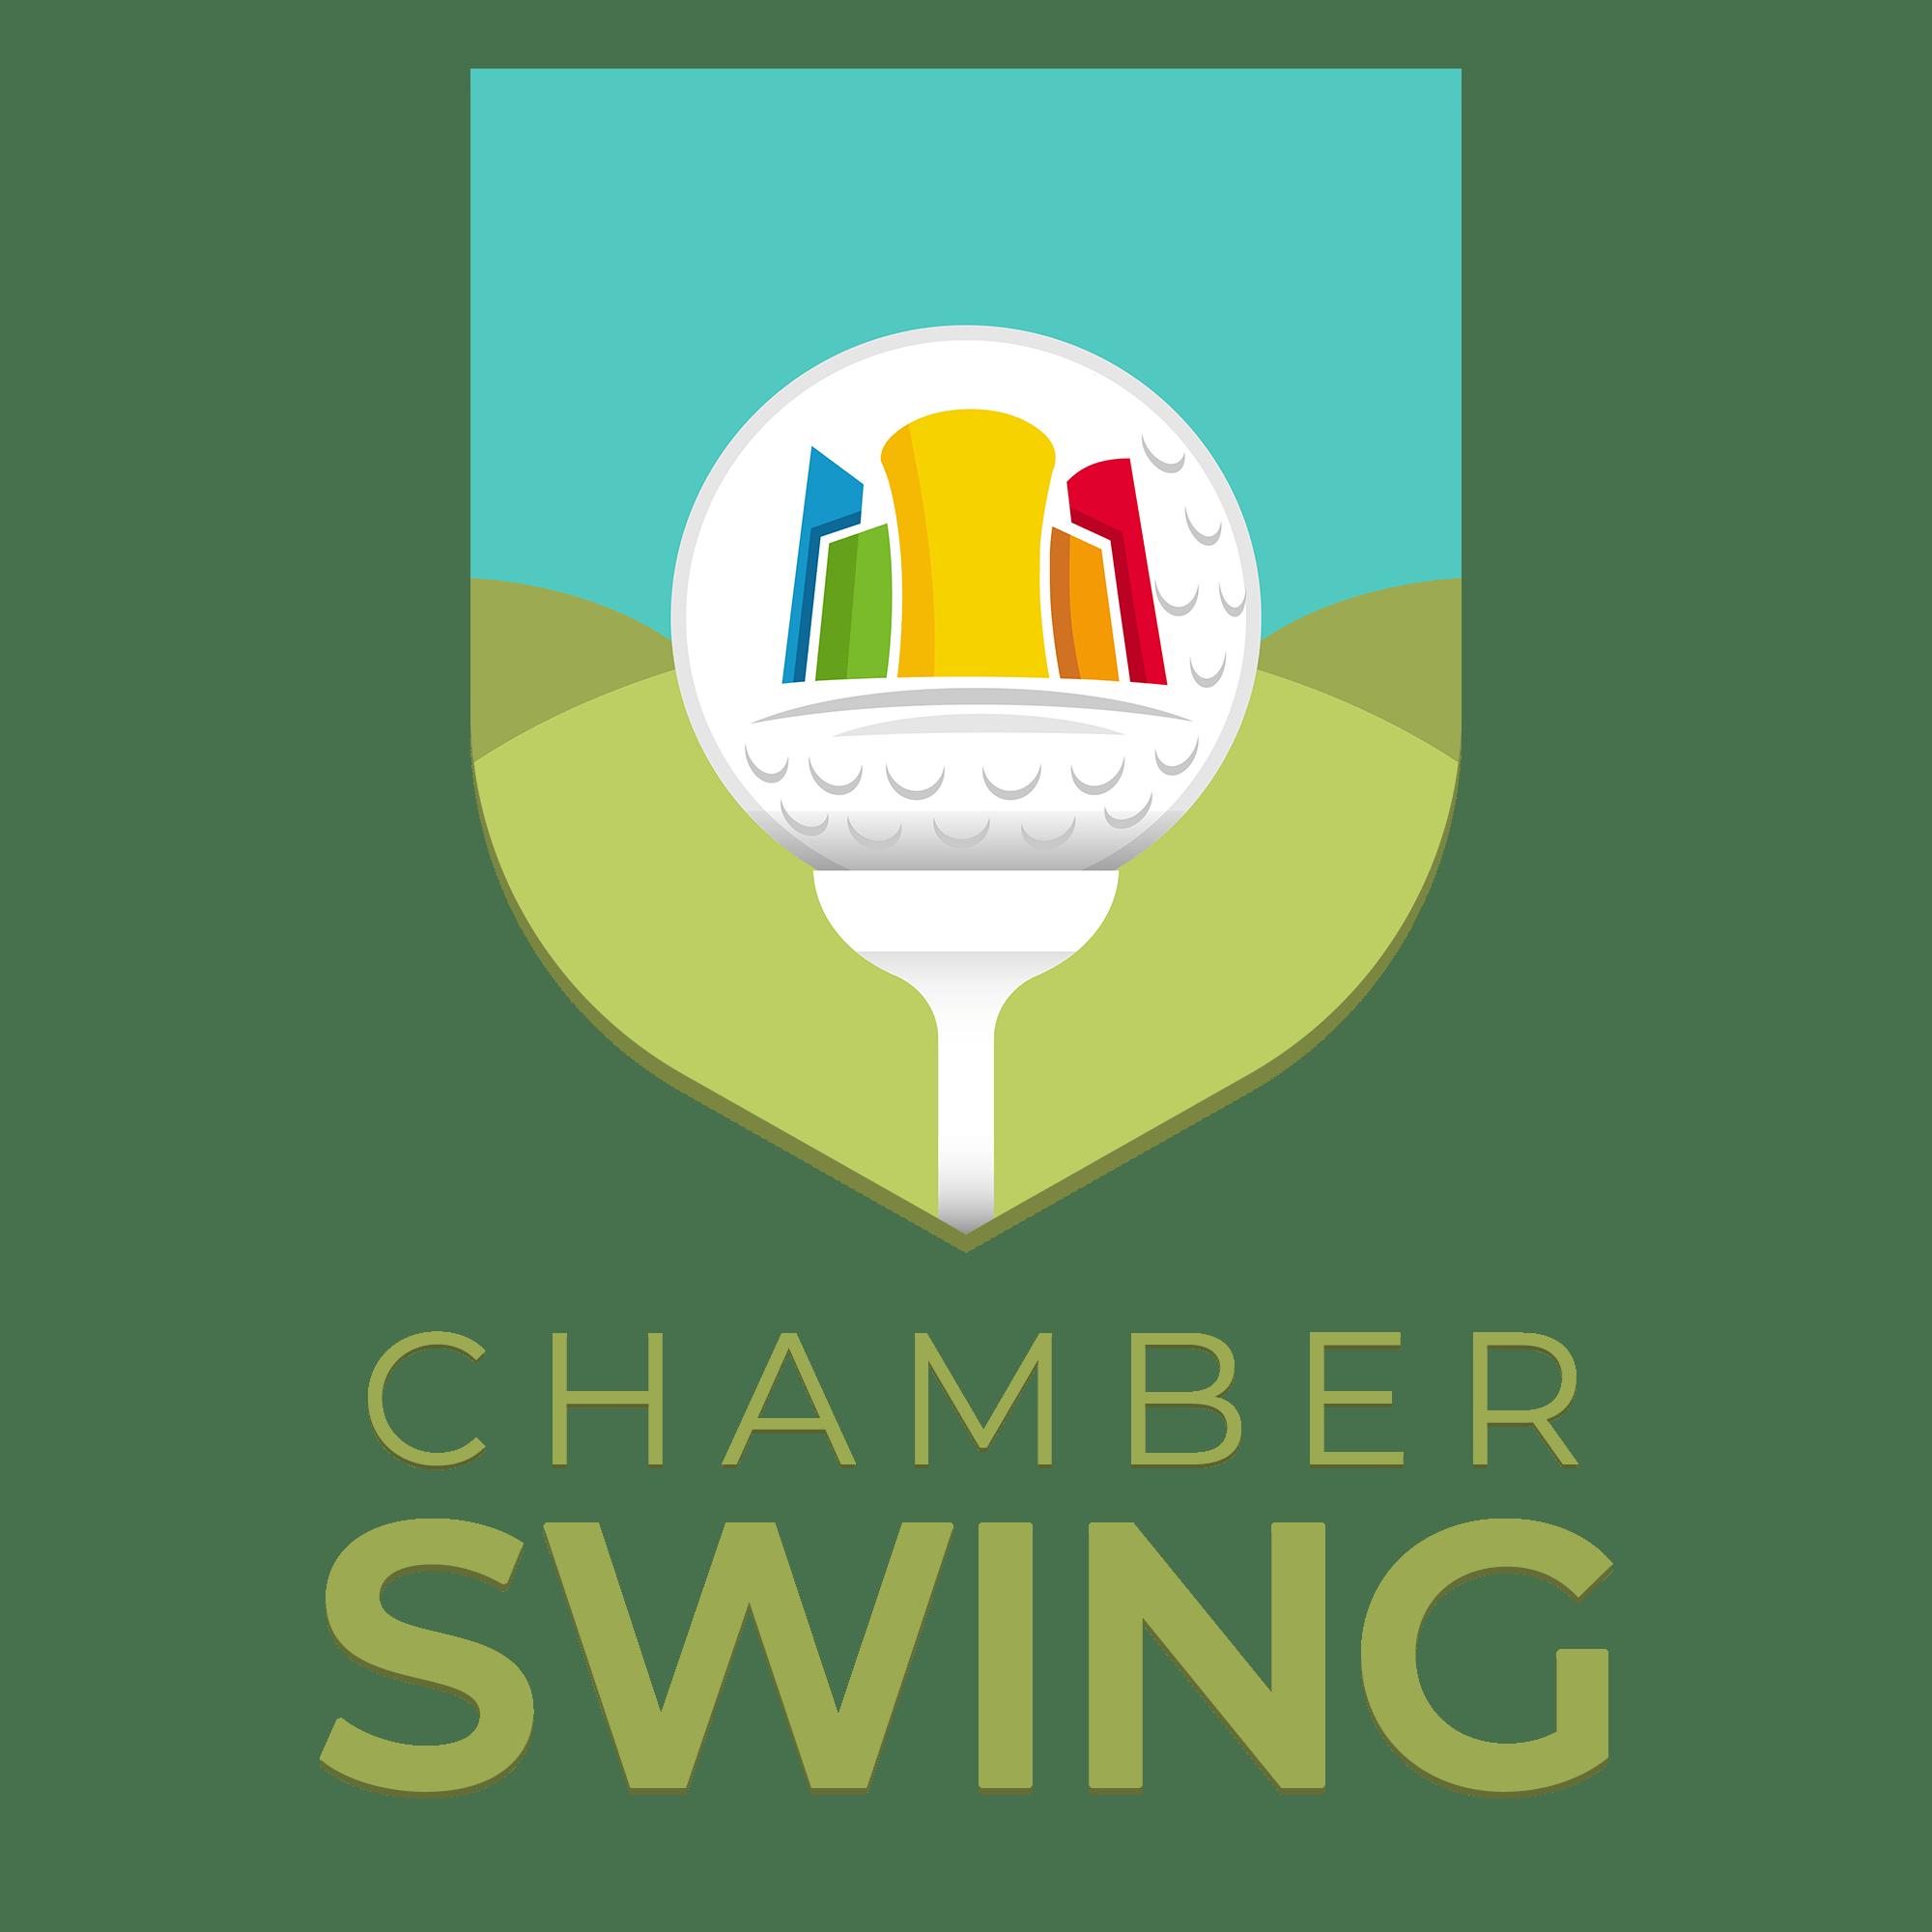 Chamber Swing